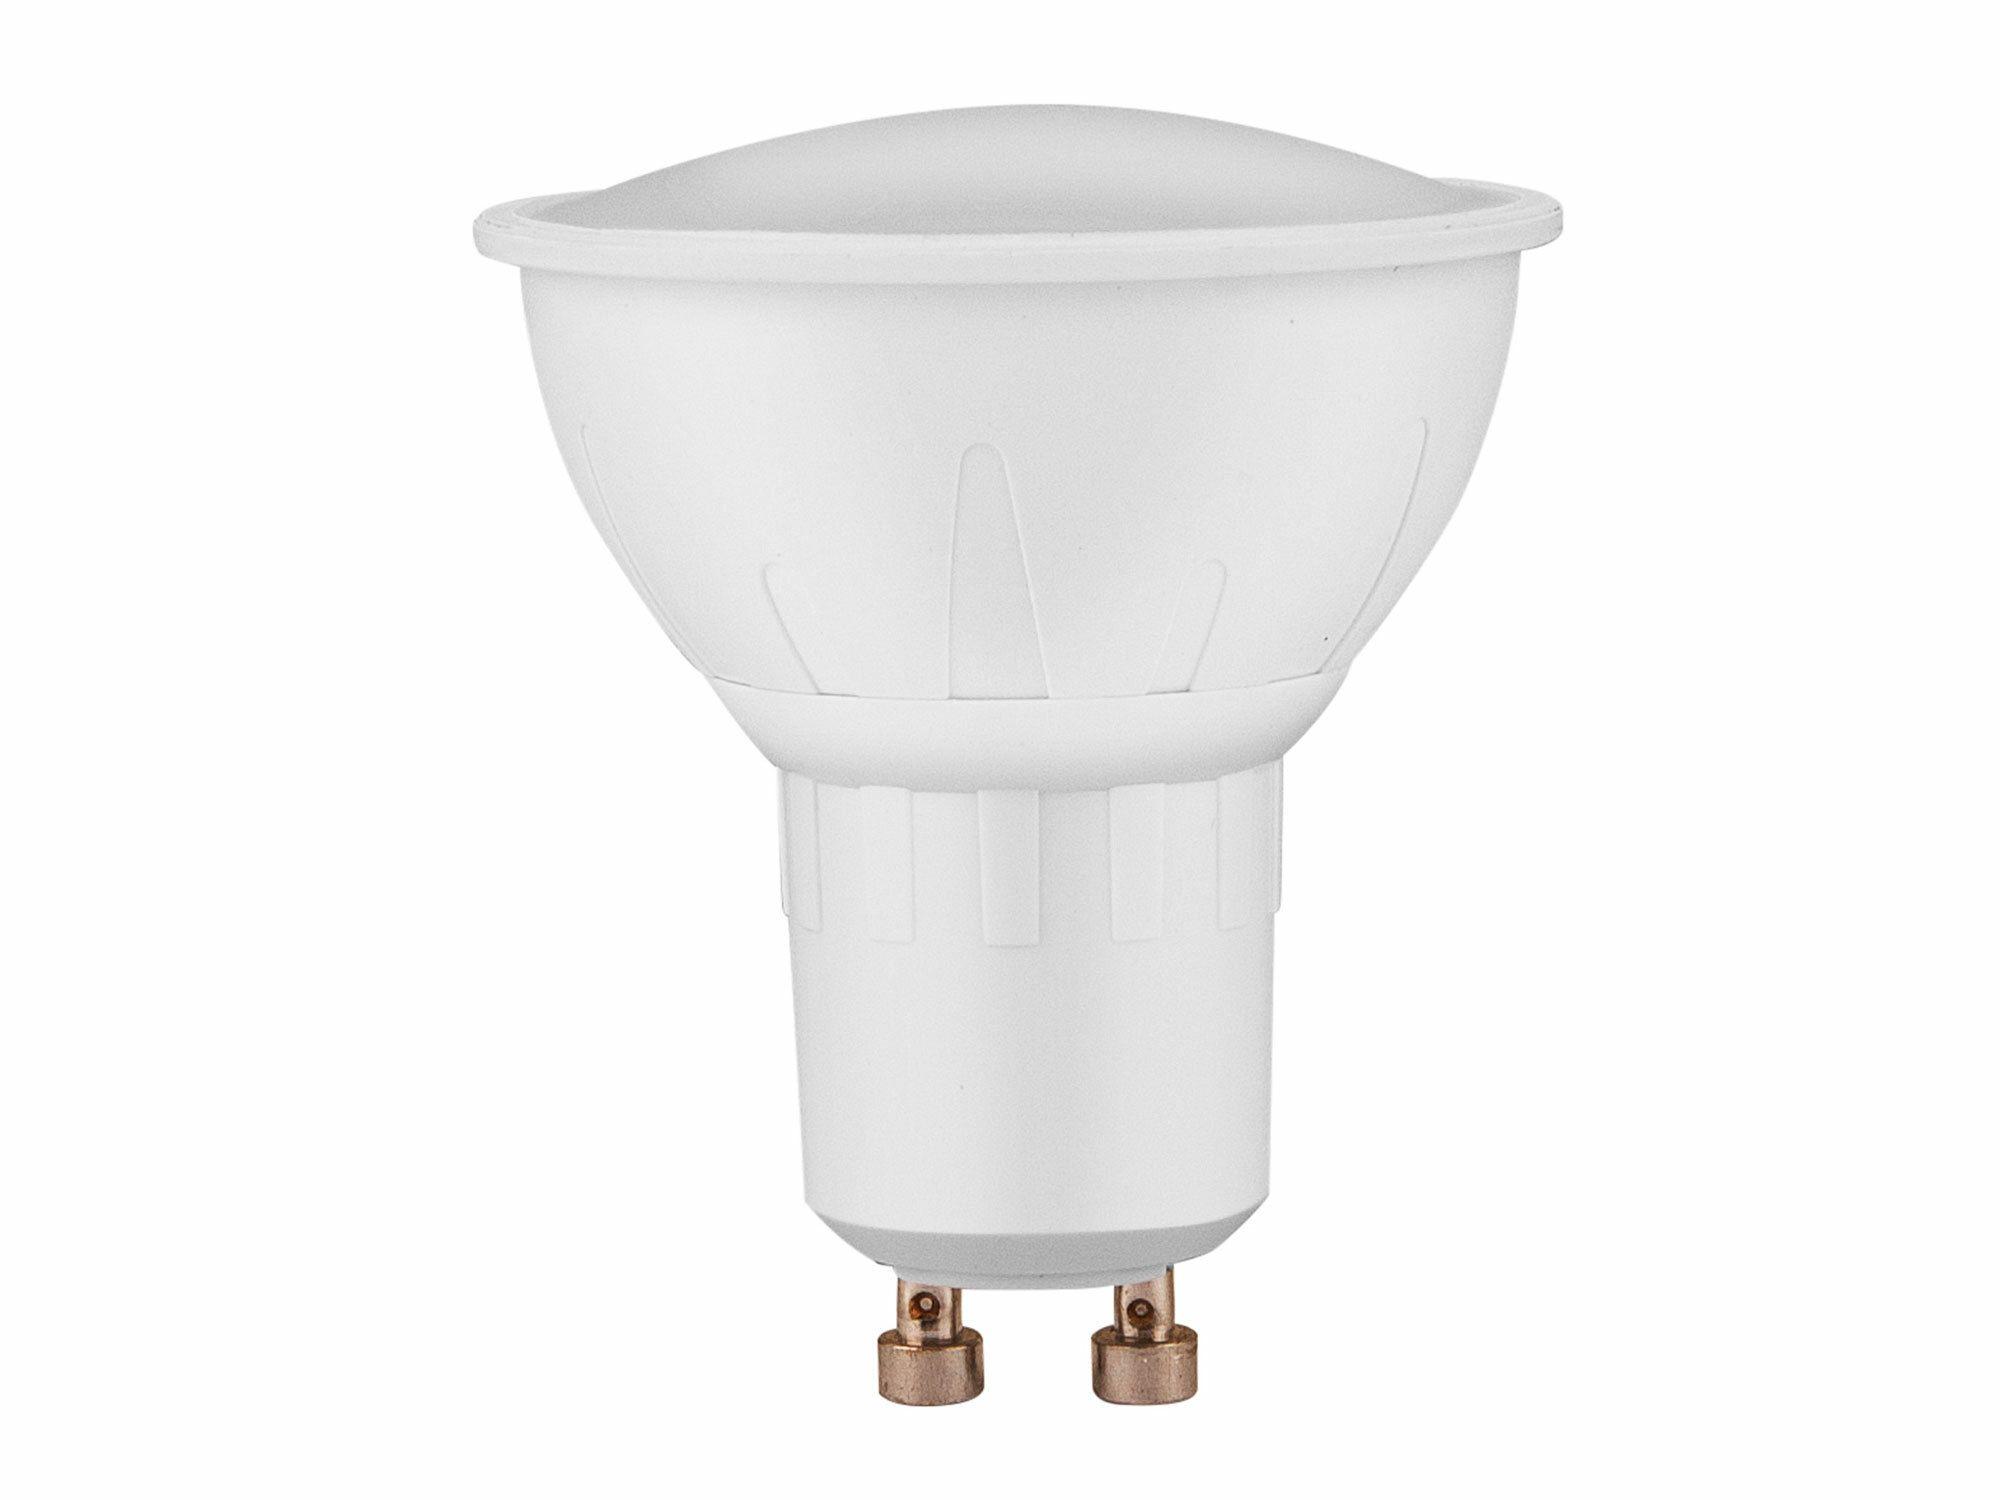 Žárovka LED reflektorová, 4W, 320lm, GU10, teplá bílá EXTOL-LIGHT